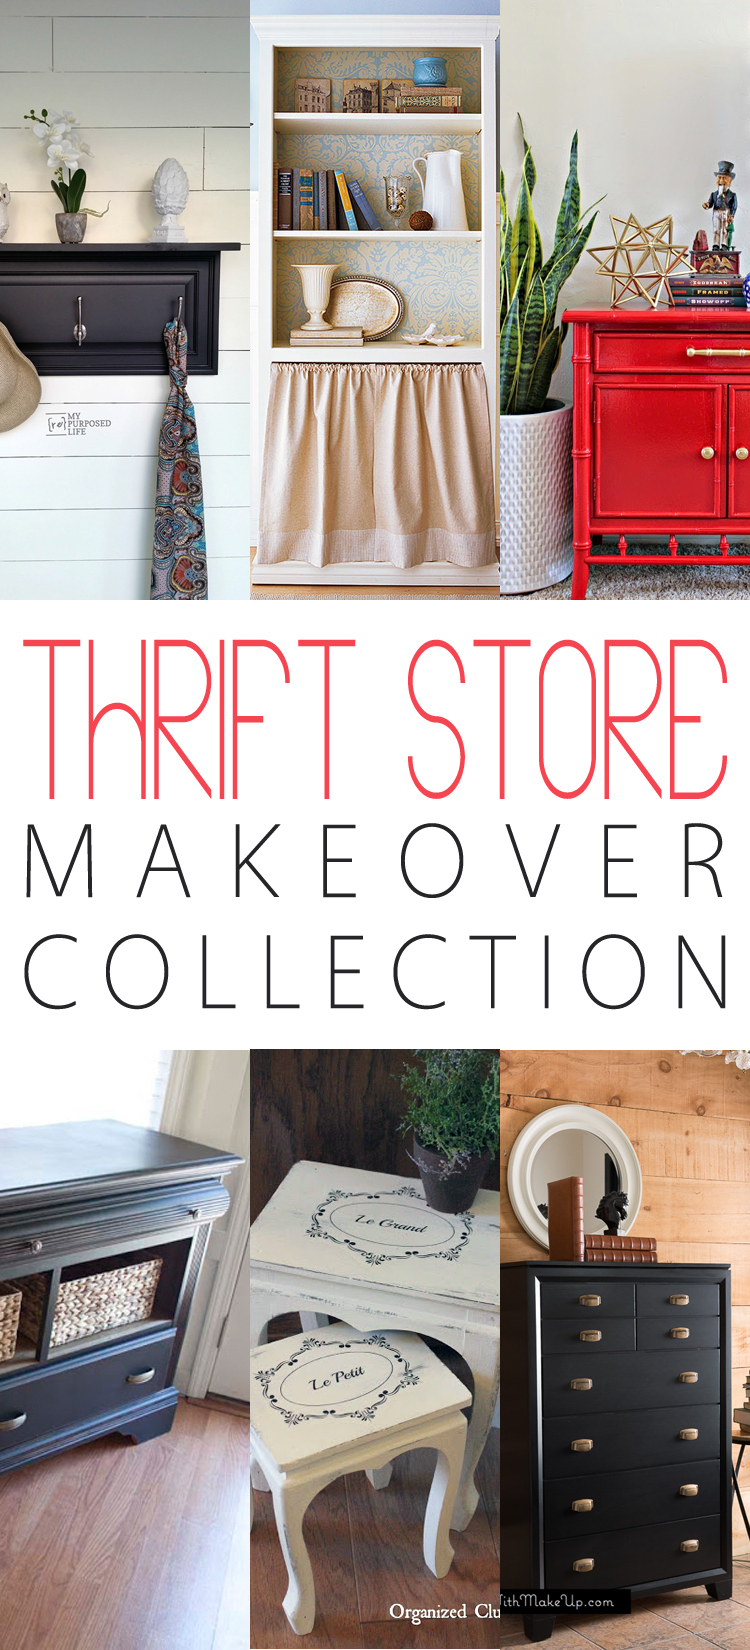 ThriftStoreMakeover-TOWER-0001